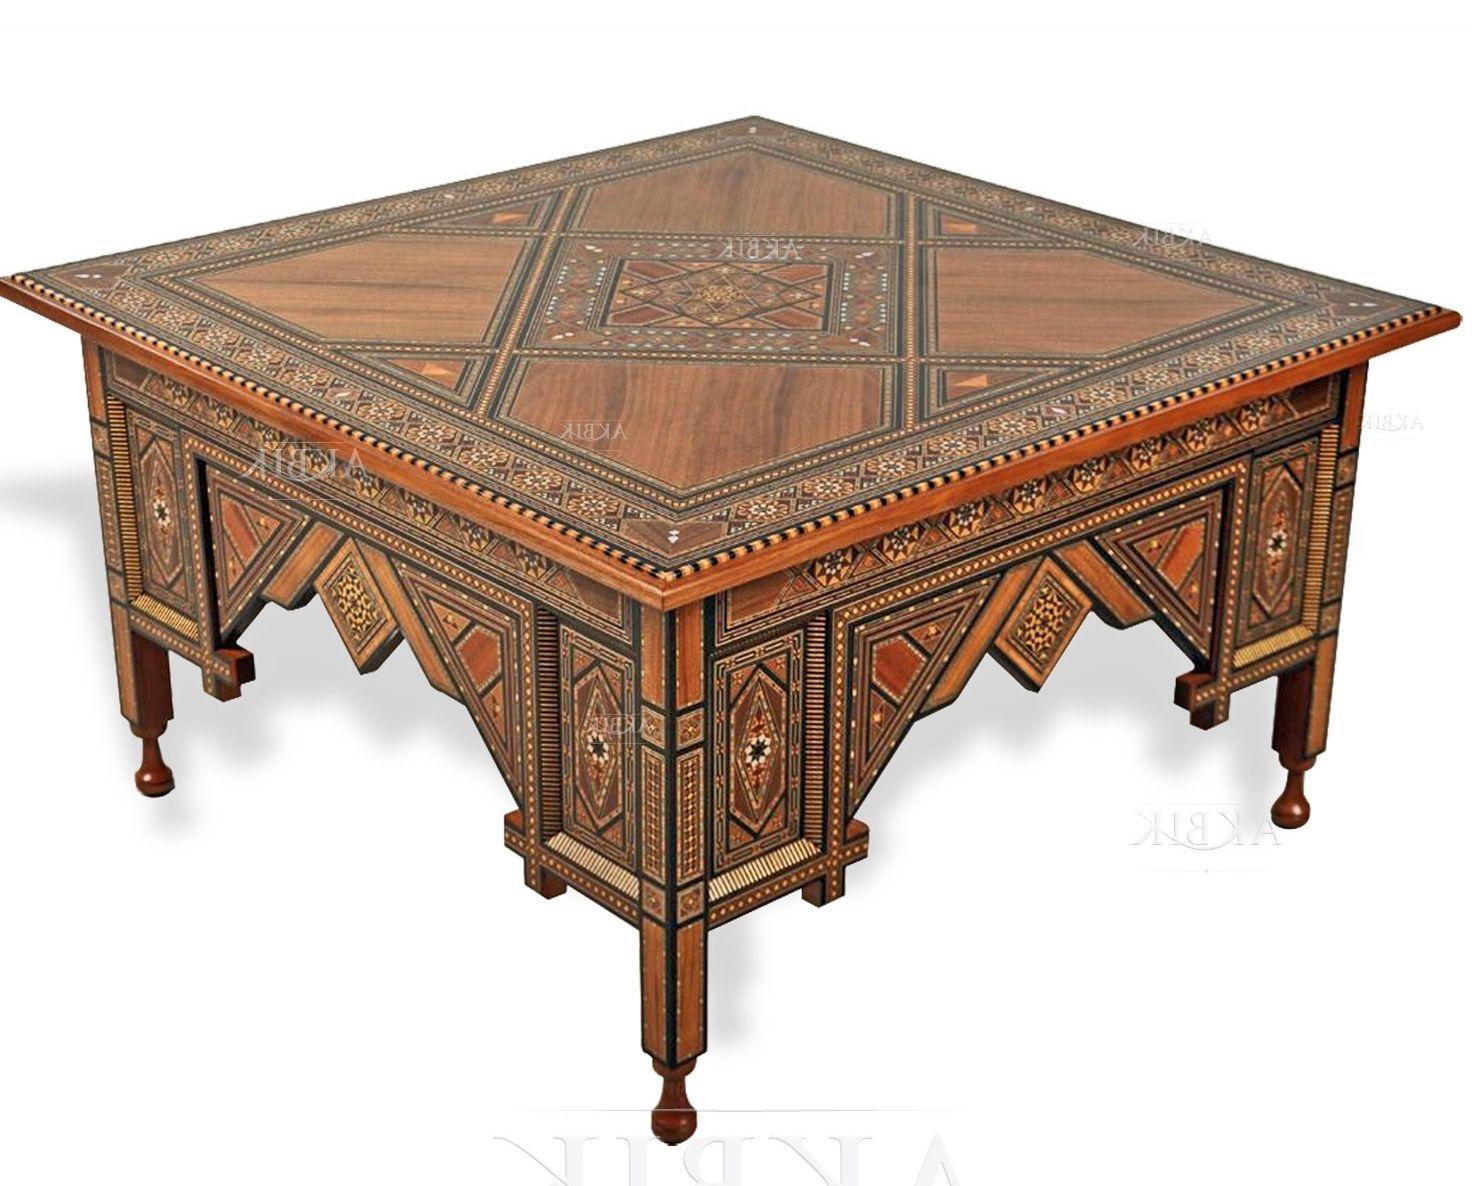 Moroccan Style Coffee Table Furniture Coffee Table Furniture Tiled Coffee Table Coffee Table [ 1186 x 1472 Pixel ]